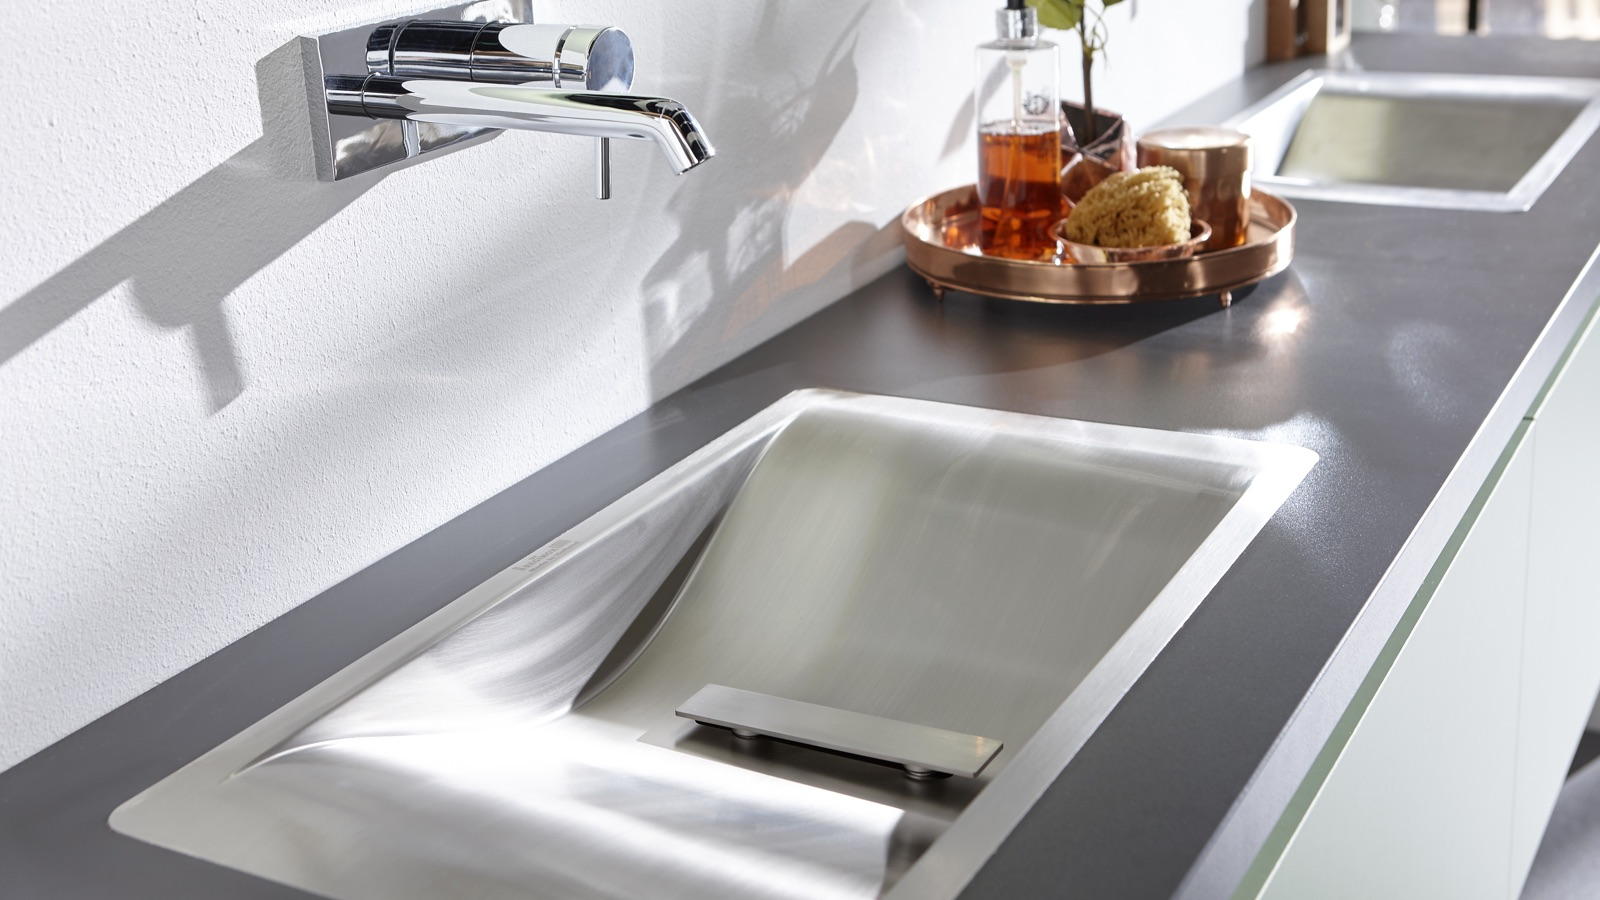 hr-kranen-wasbak-stijl-badkamer-mijnbad-in-stijl